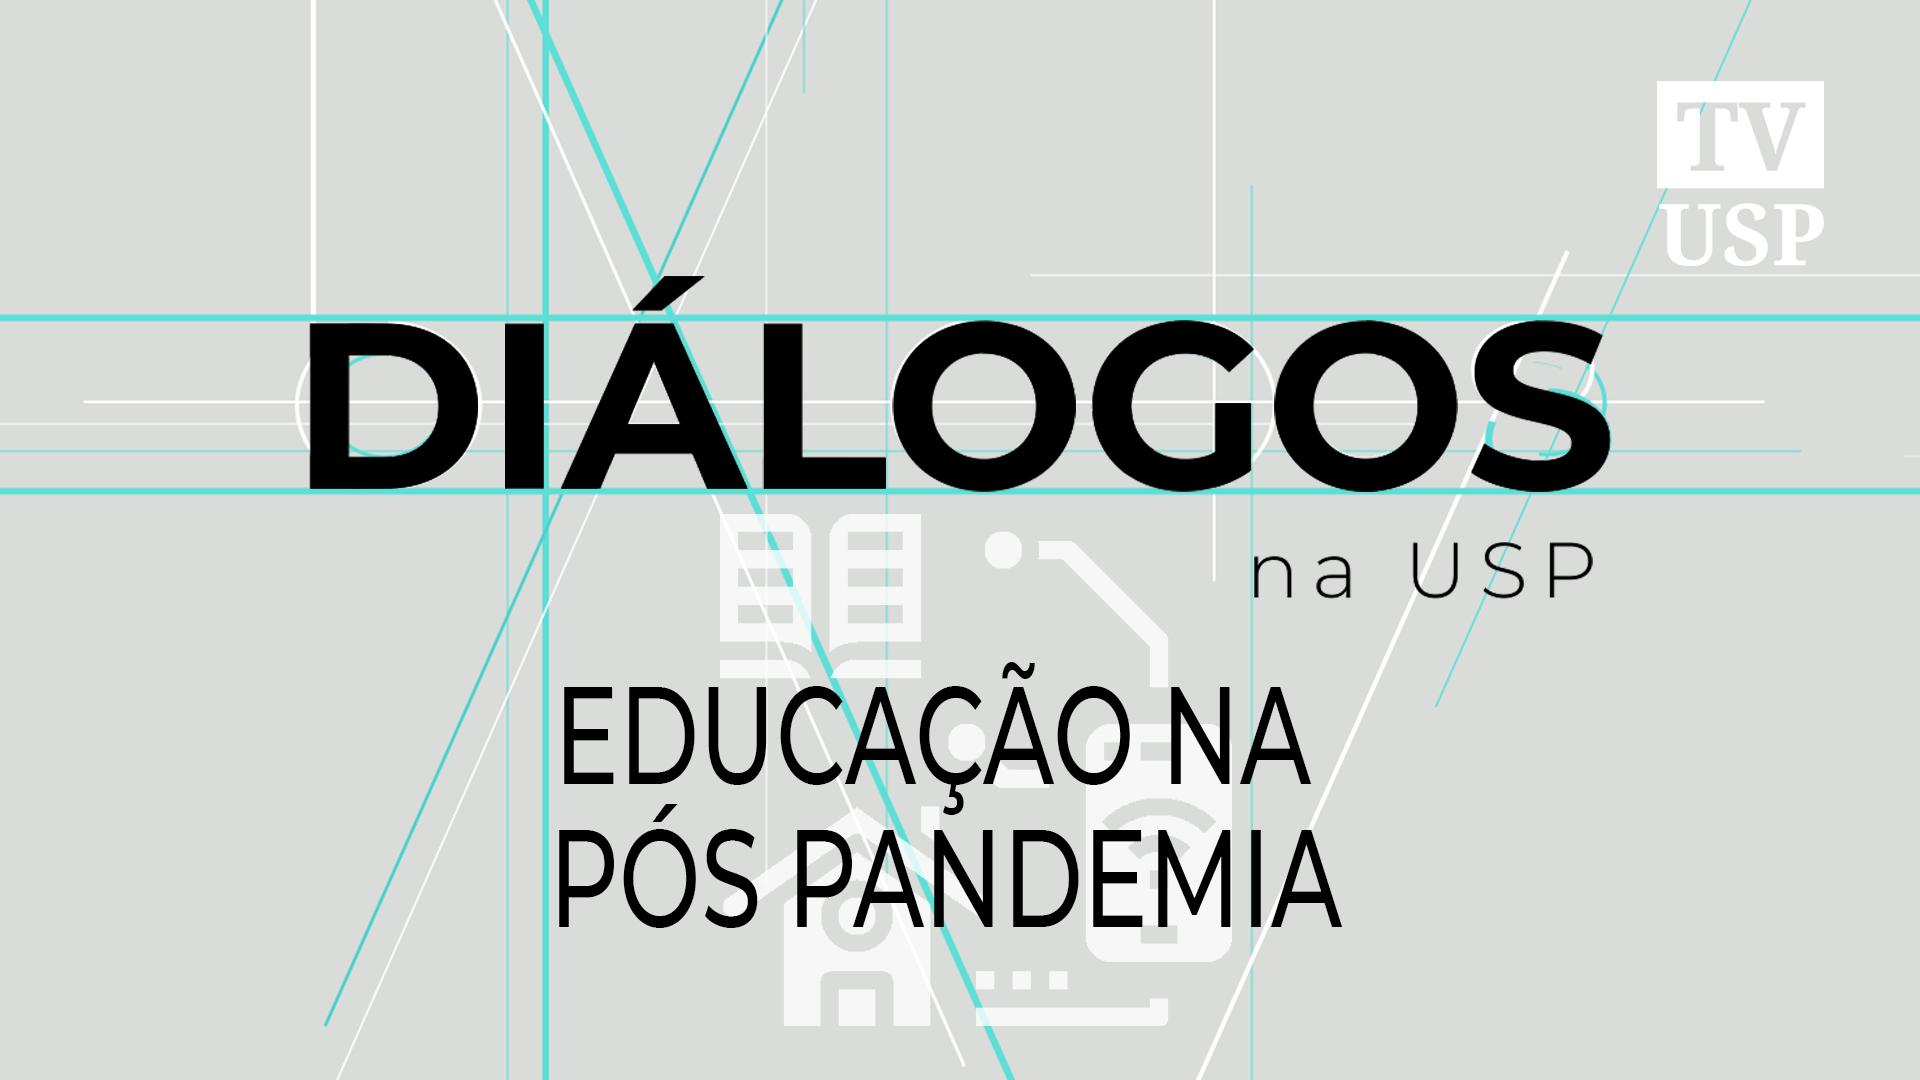 thumb_DIALOGOS_educacao_p-p